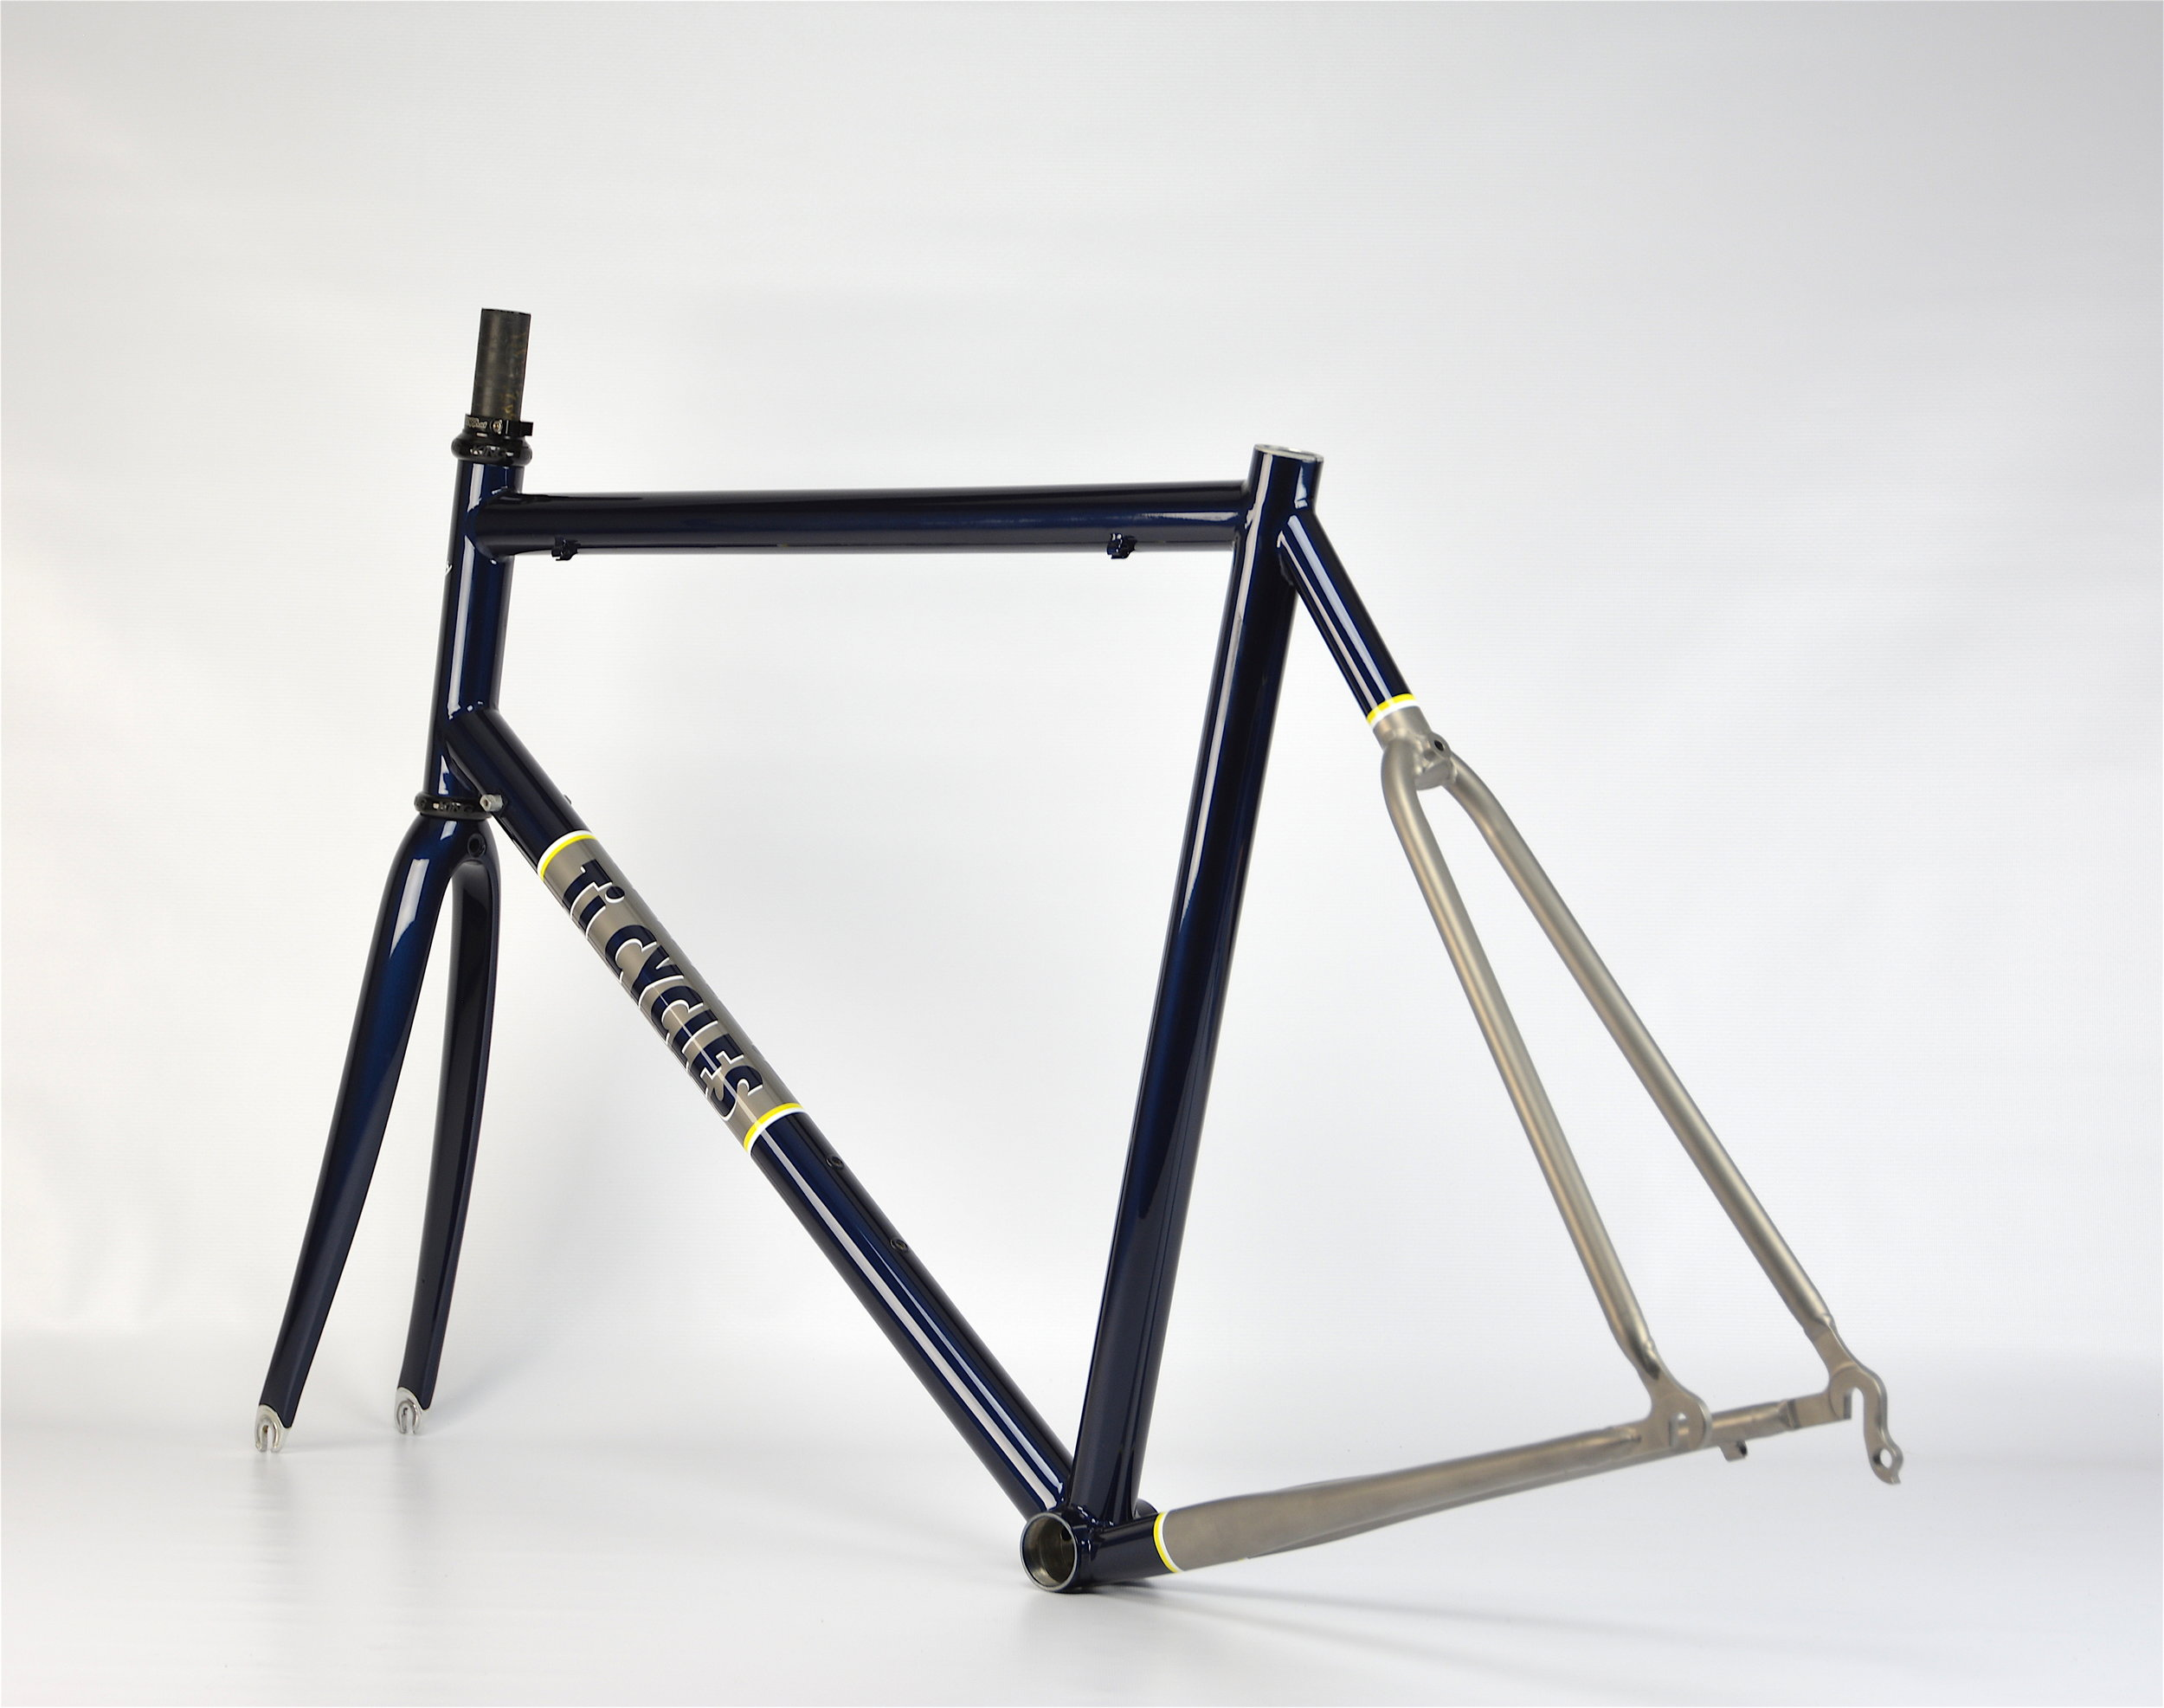 Ti Cycles Restoration_0103 copy.JPG